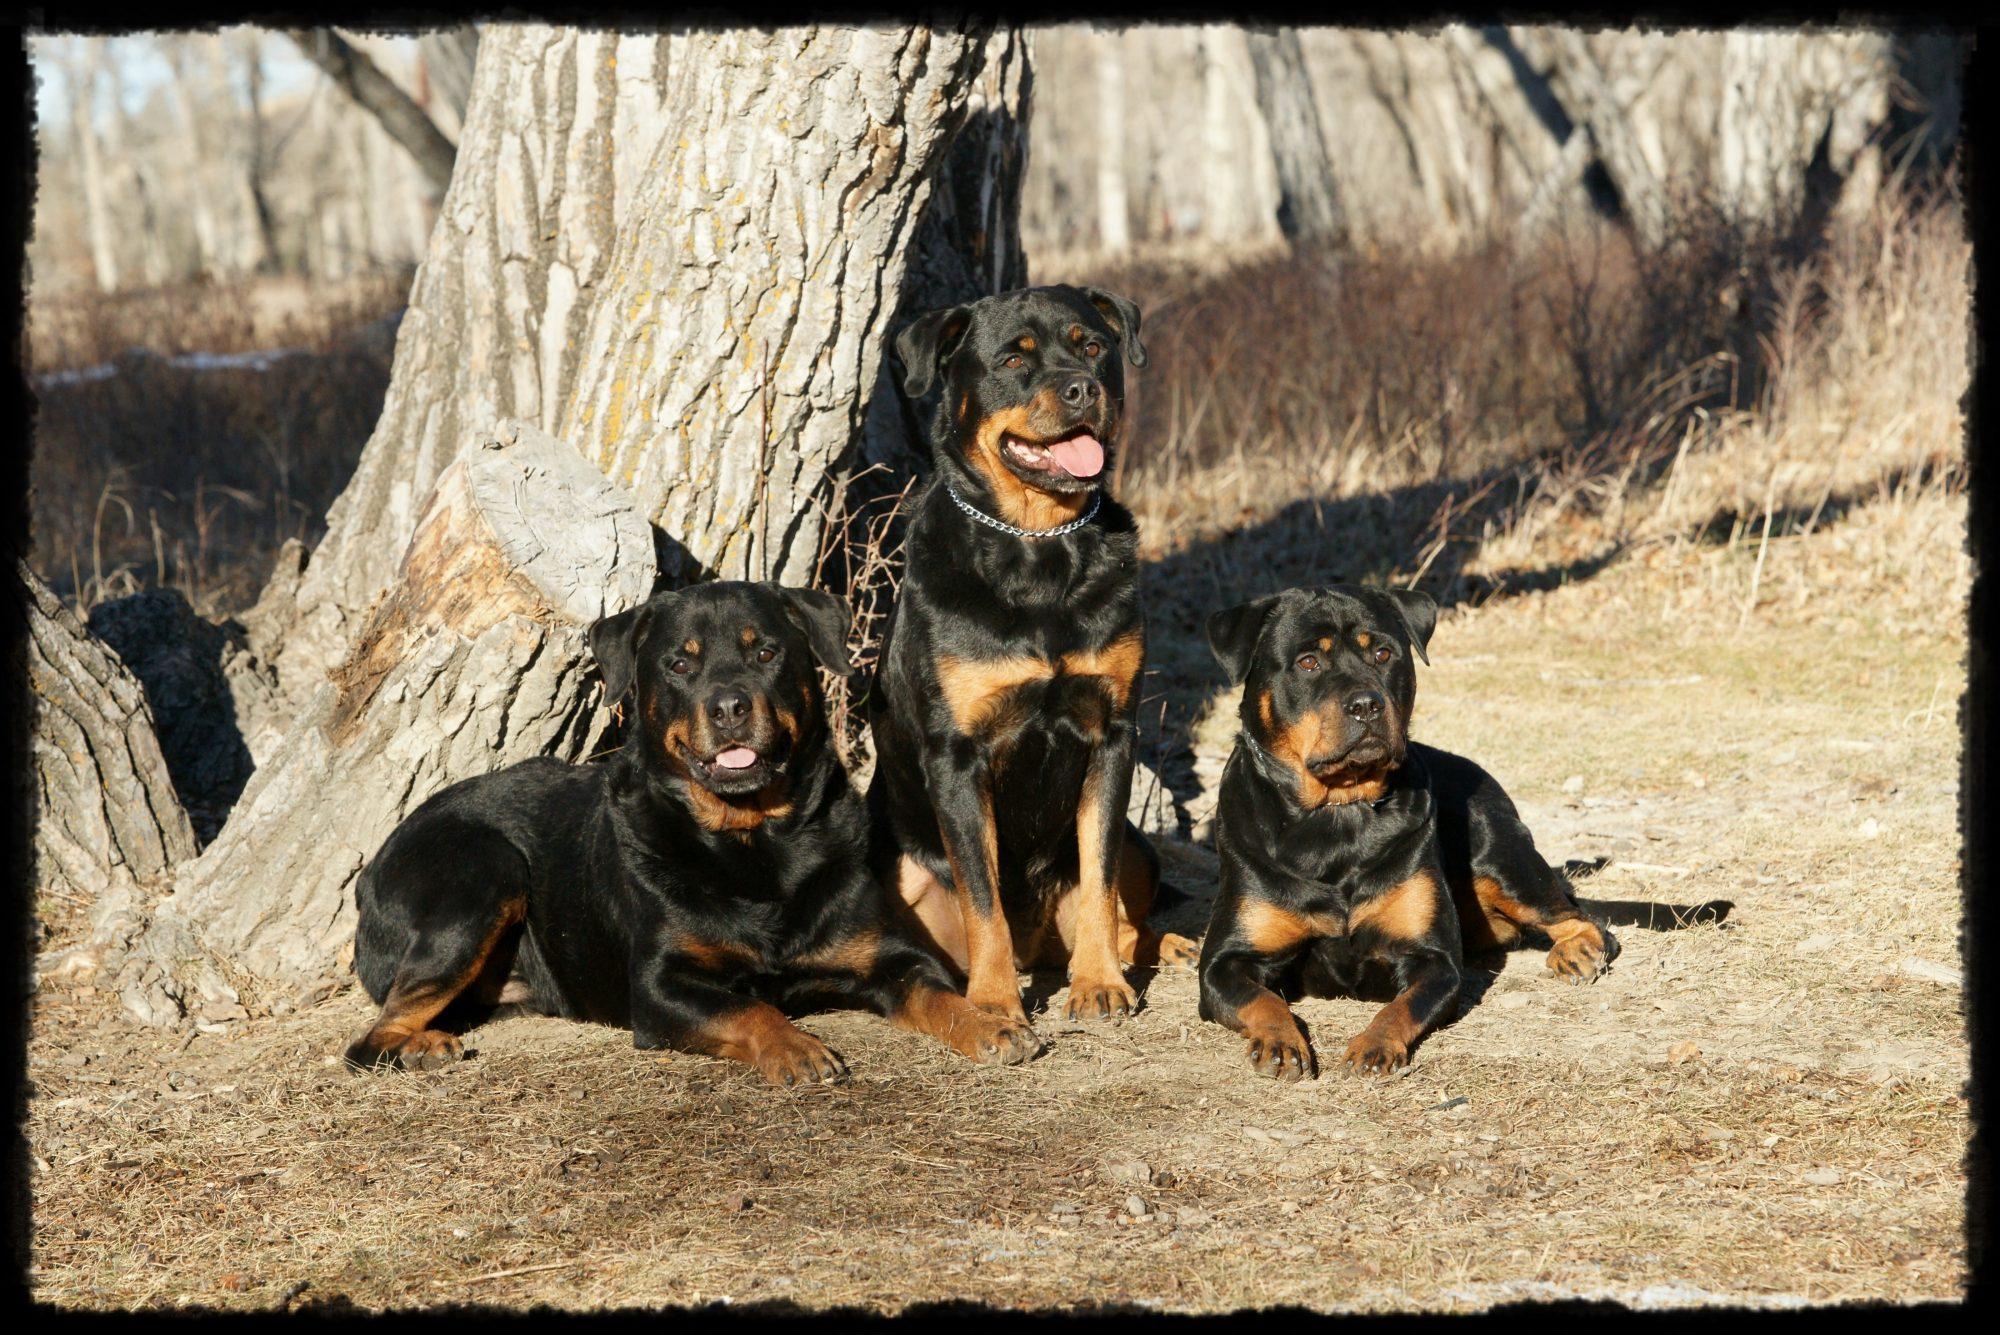 Akamai Perm. Registered Rottweilers